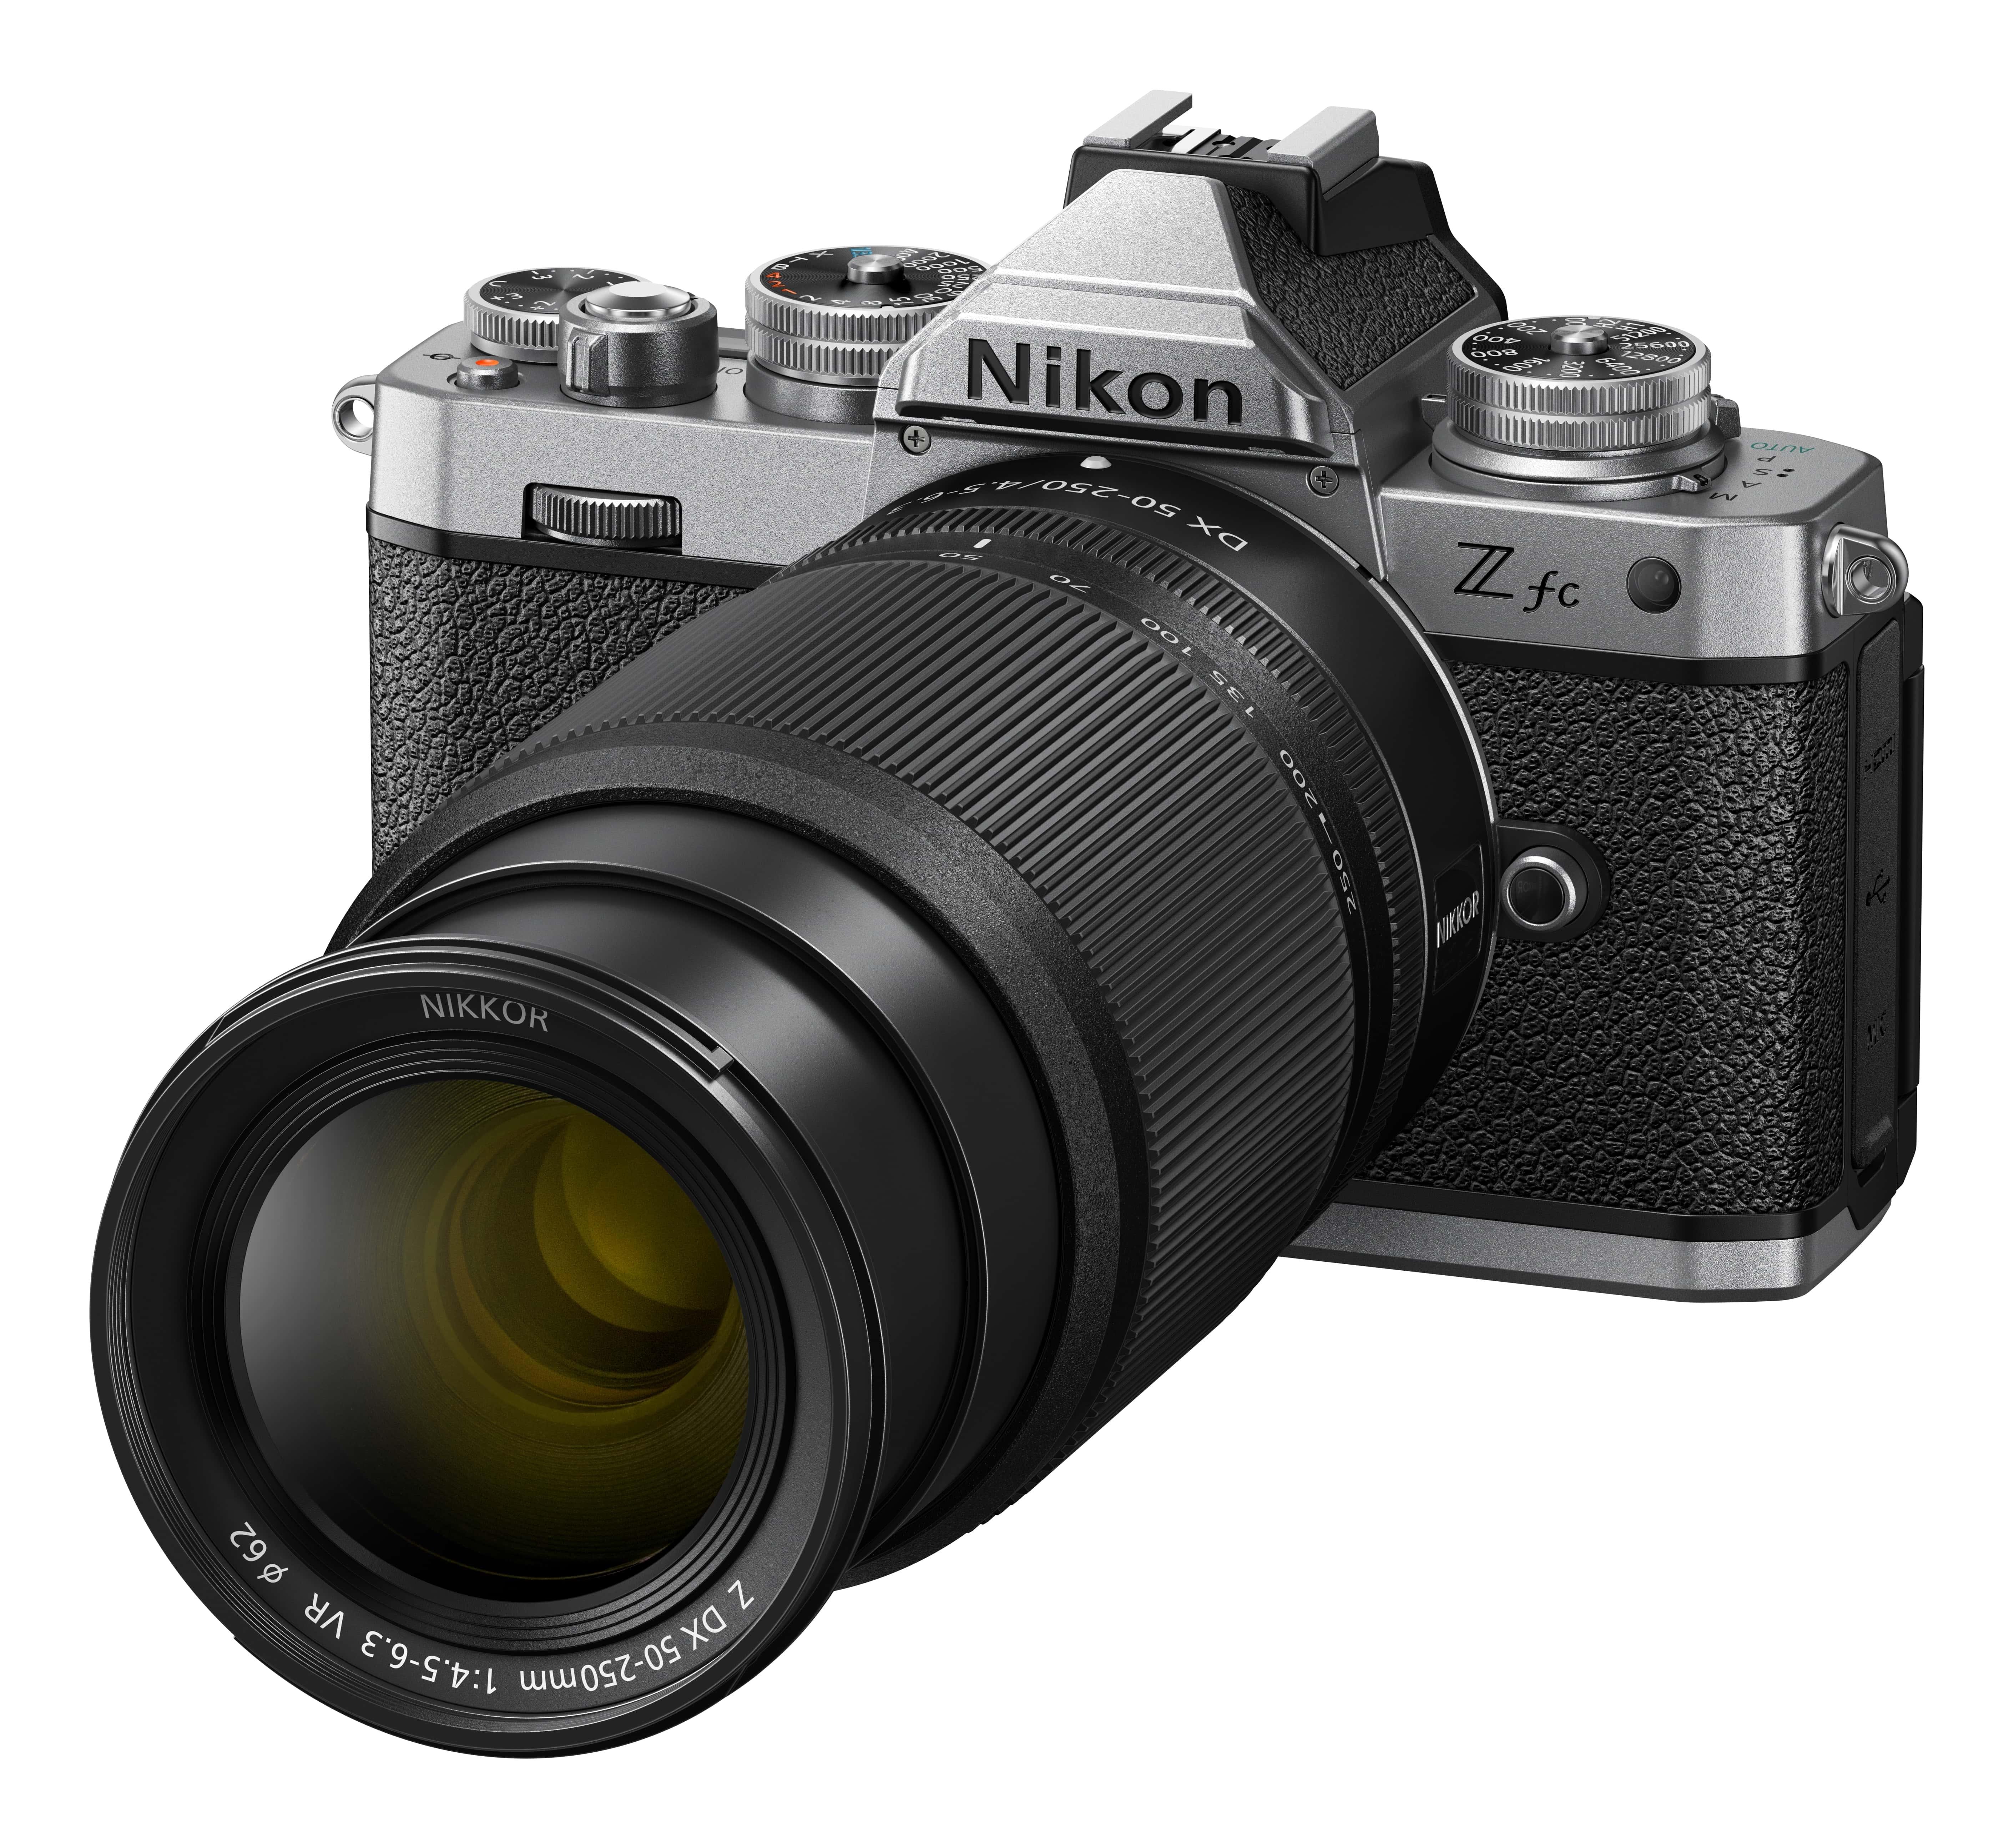 Nikon Z fc + NIKKOR Z DX 16-50mm 1:3,5-6,3 VR silber + Z DX 50-250mm 1:4.5-6.3 VR